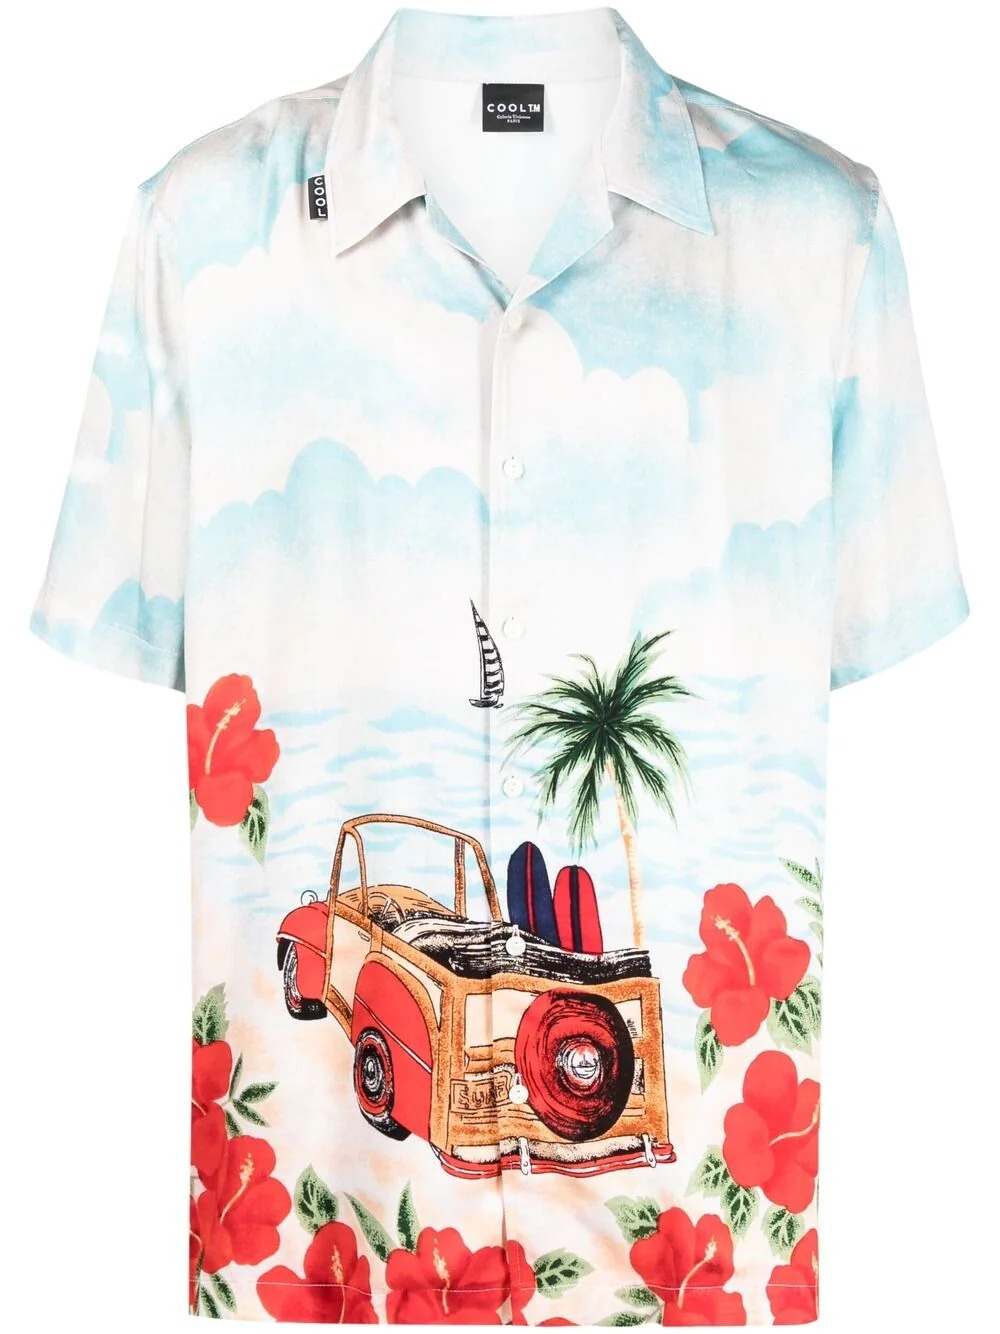 COOL.TM Tropical-Print Hawaiian Shirt